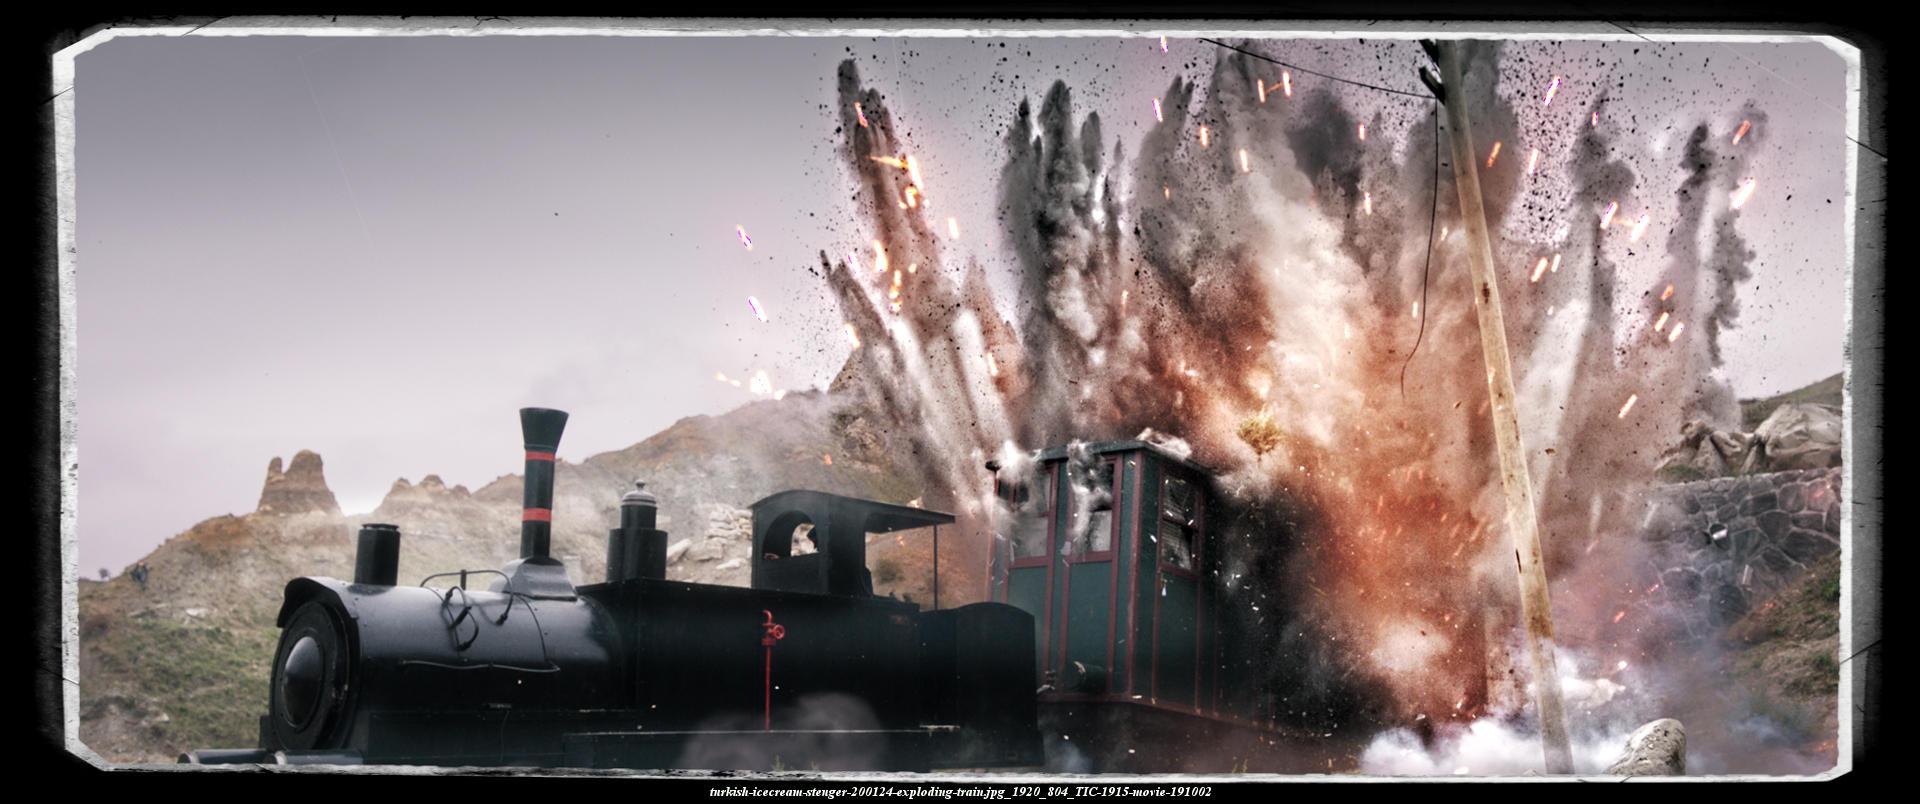 turkish-ICECREAM-heavy bomb explosion tears train wagons to pieces